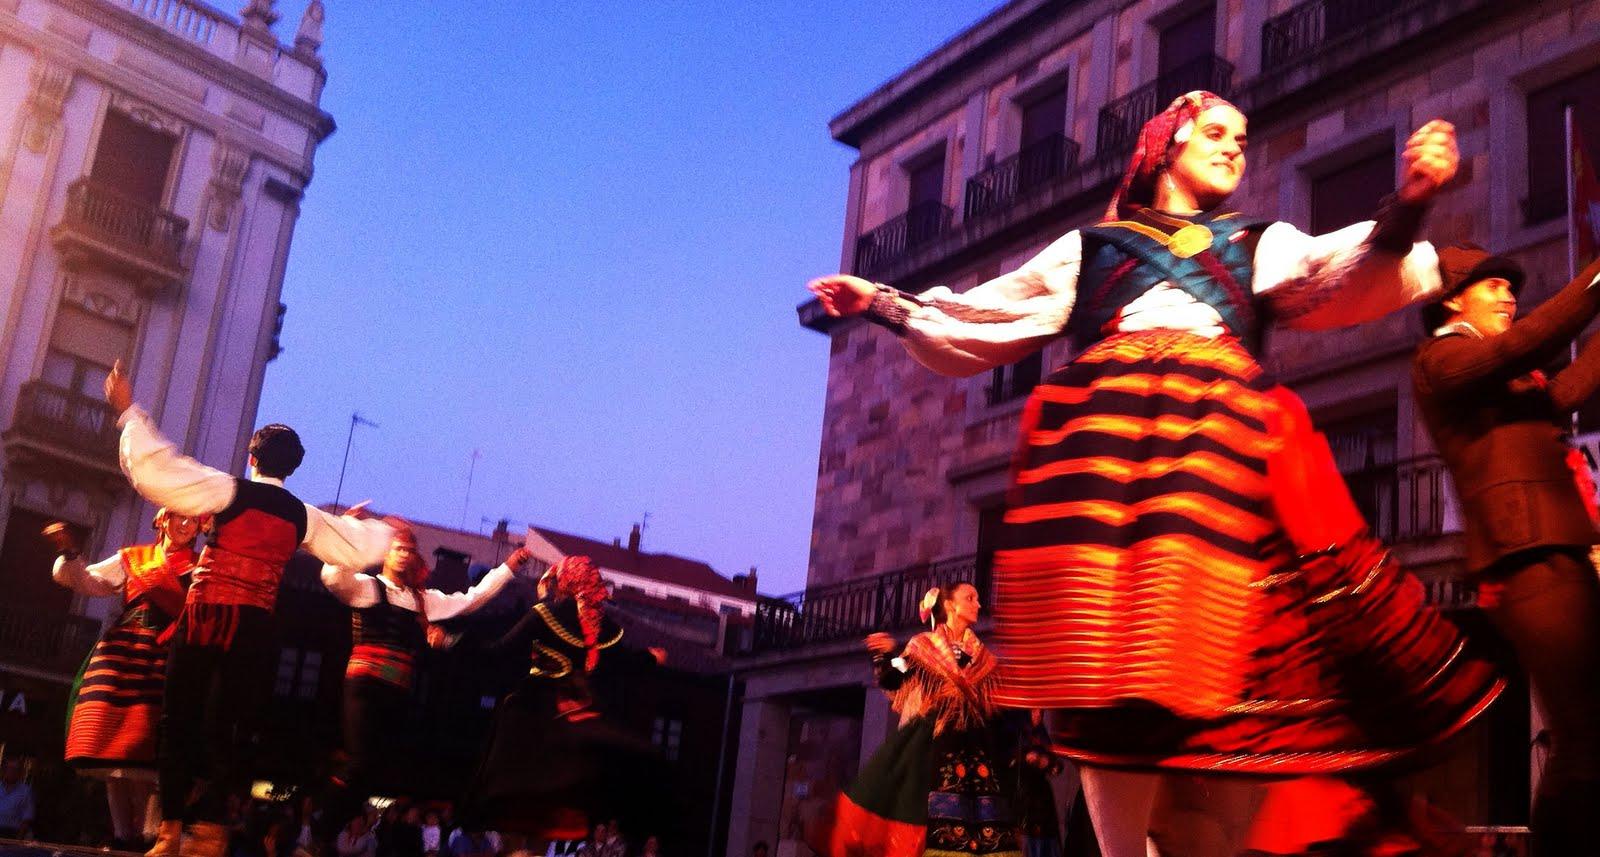 DON SANCHO. Difusión de la Cultura Tradicional de Zamora ... - photo#48